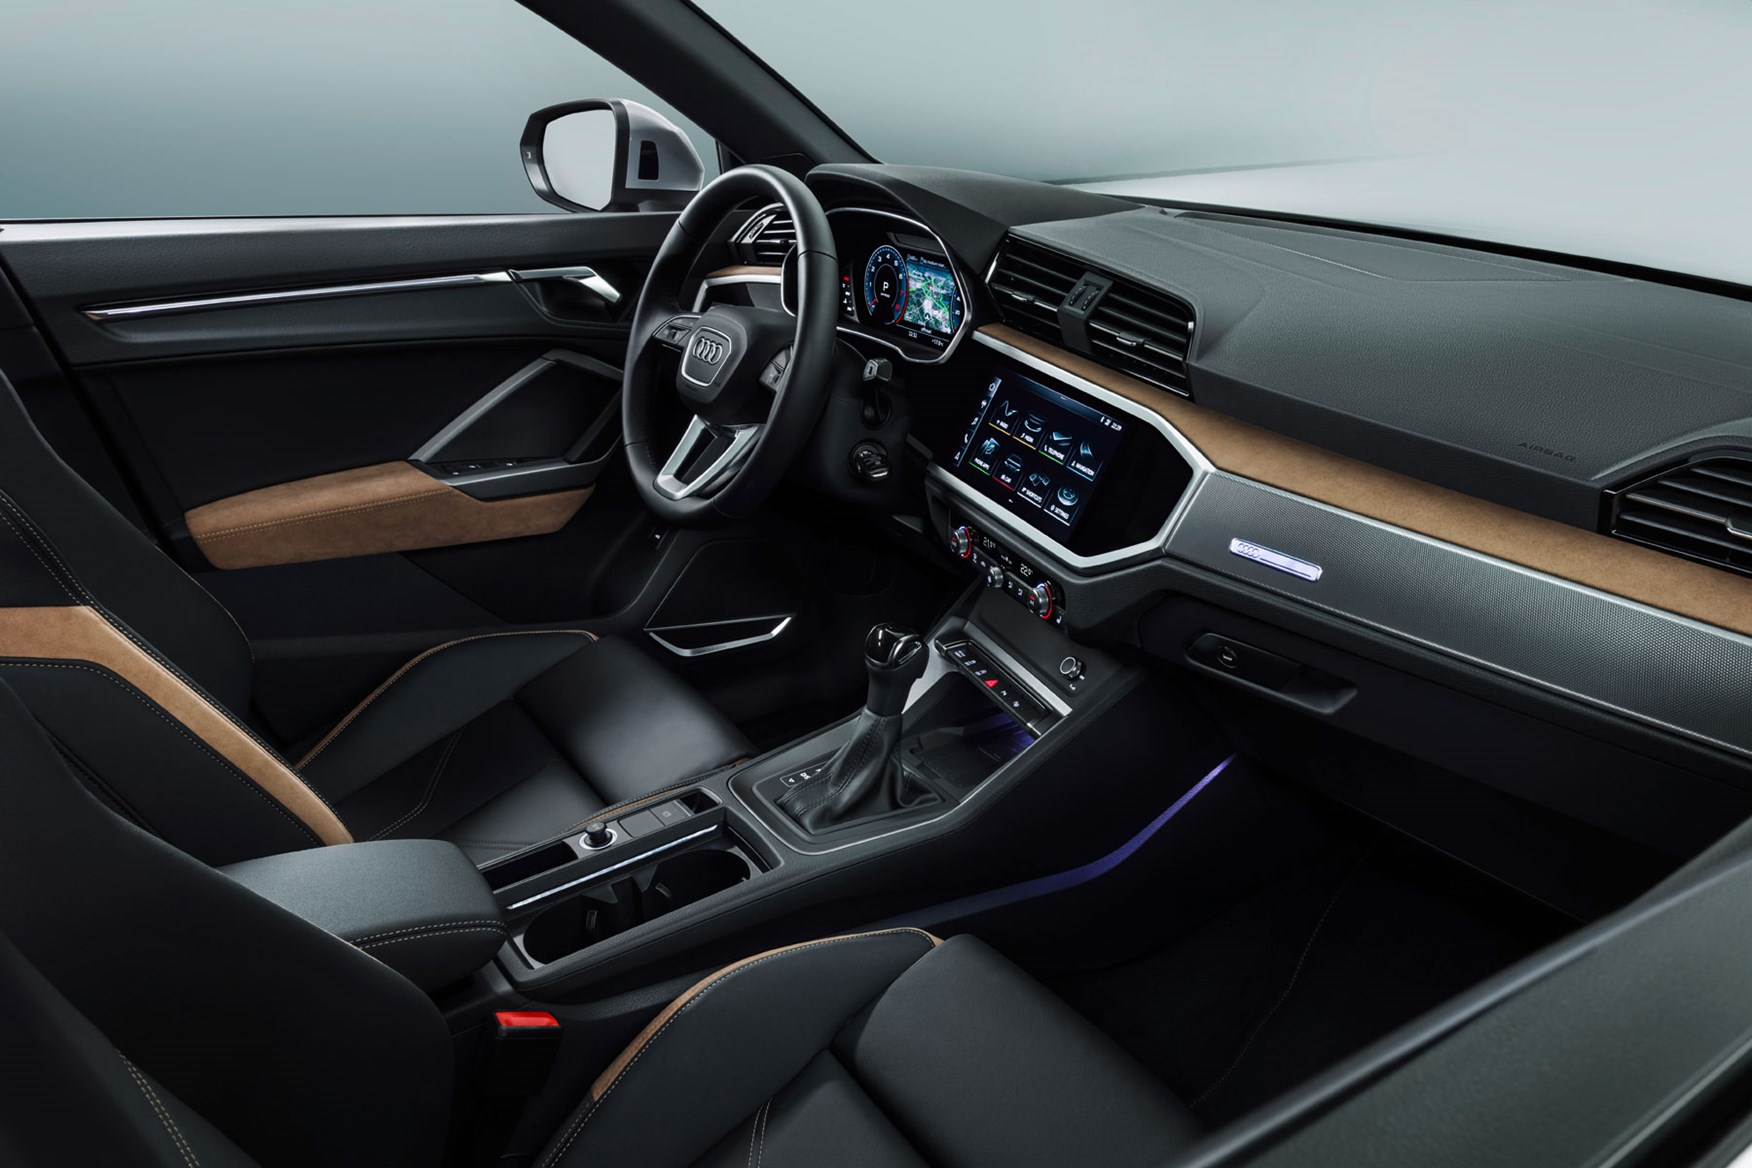 New Audi Q In Parkers - Audi q3 2018